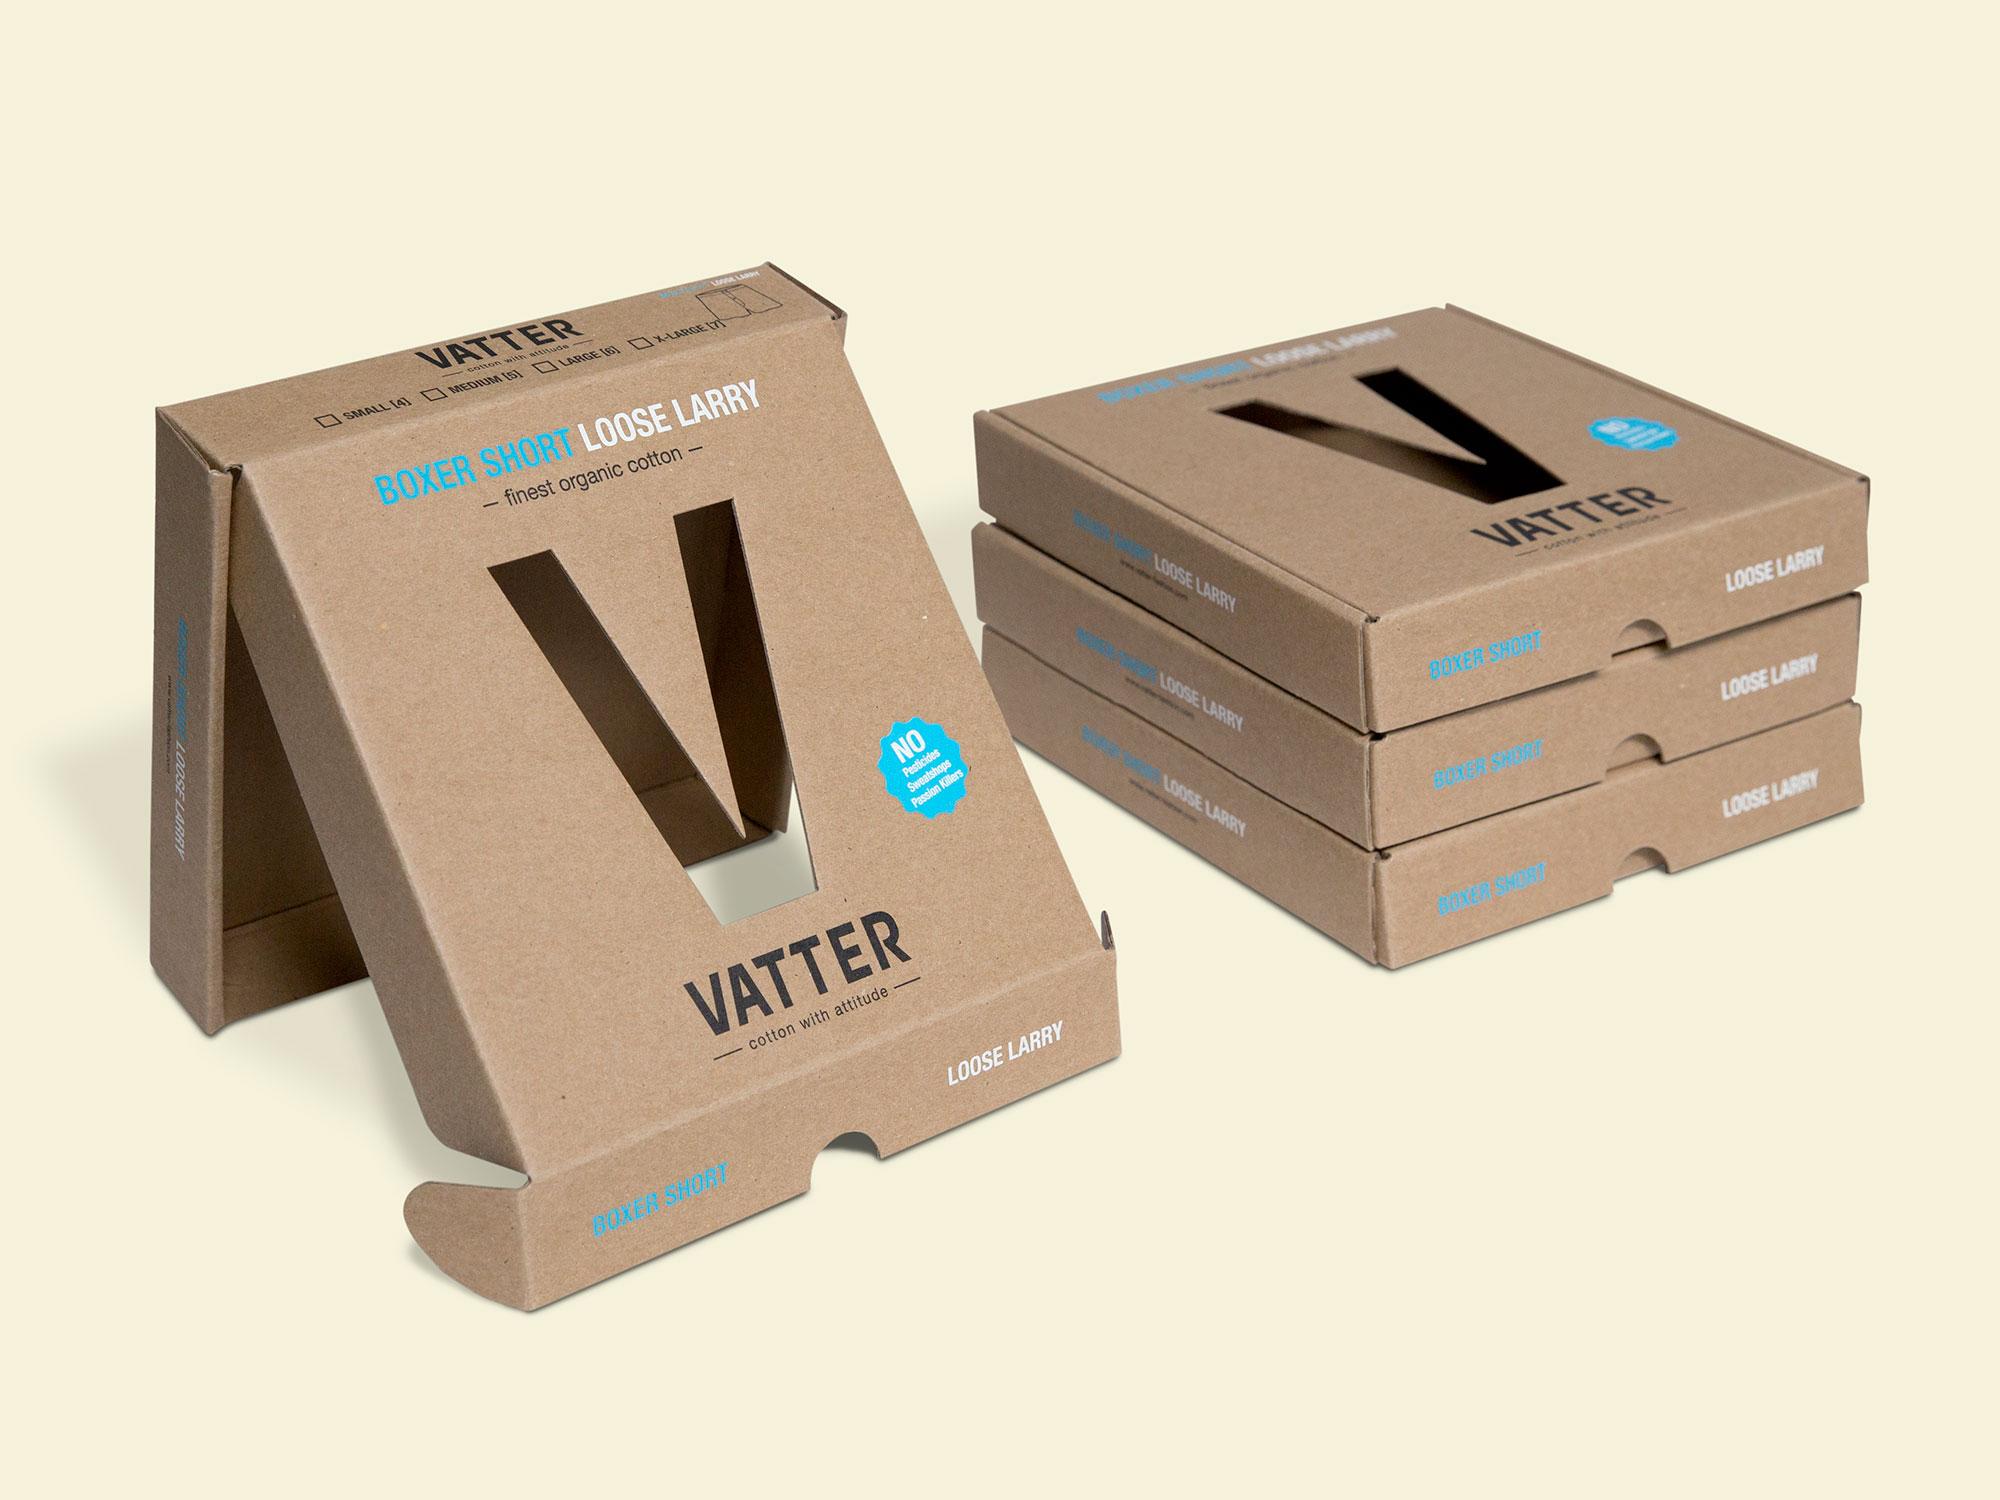 vatter3